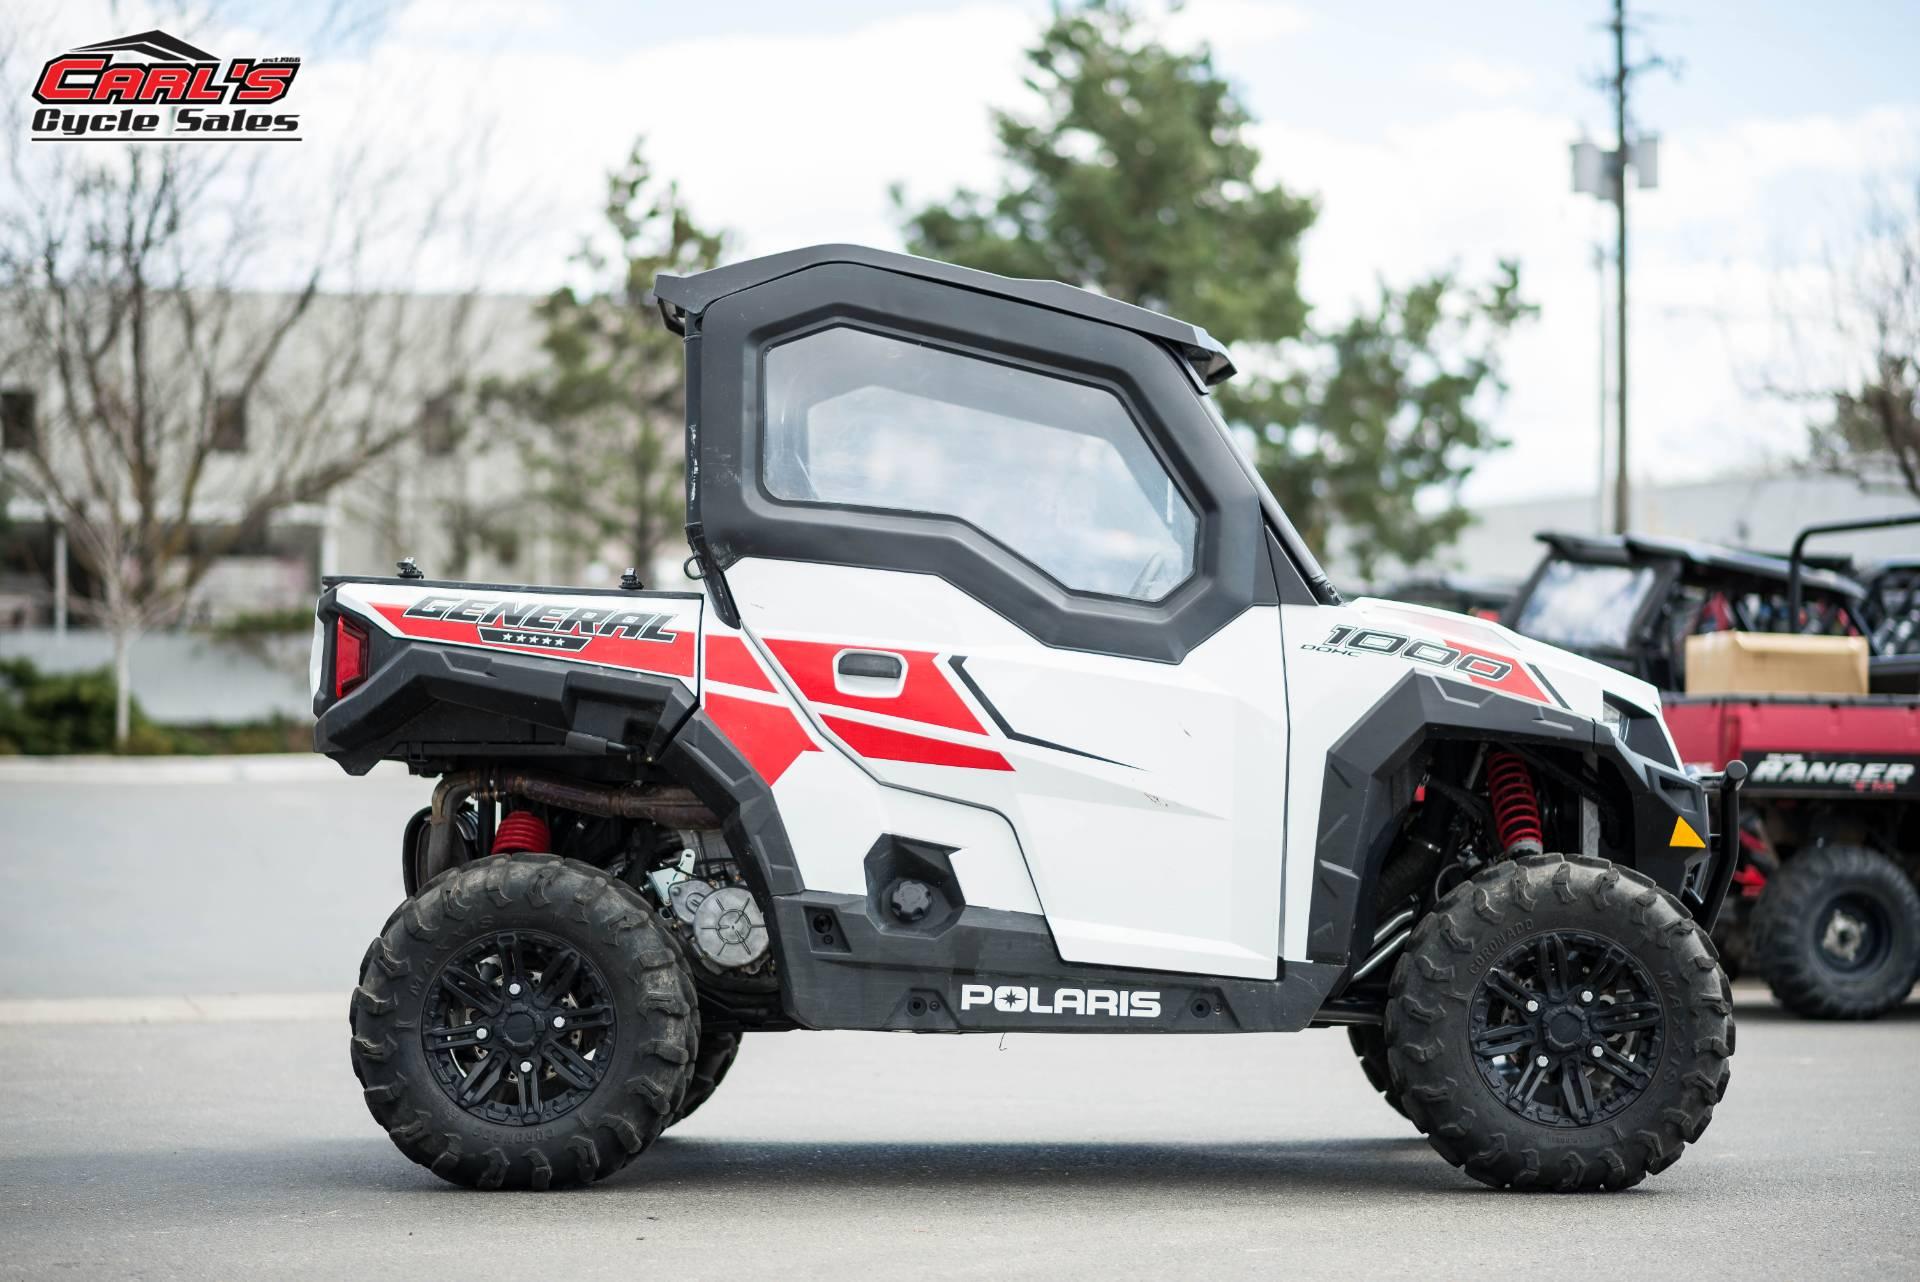 2017 Polaris General 1000 EPS in Boise, Idaho